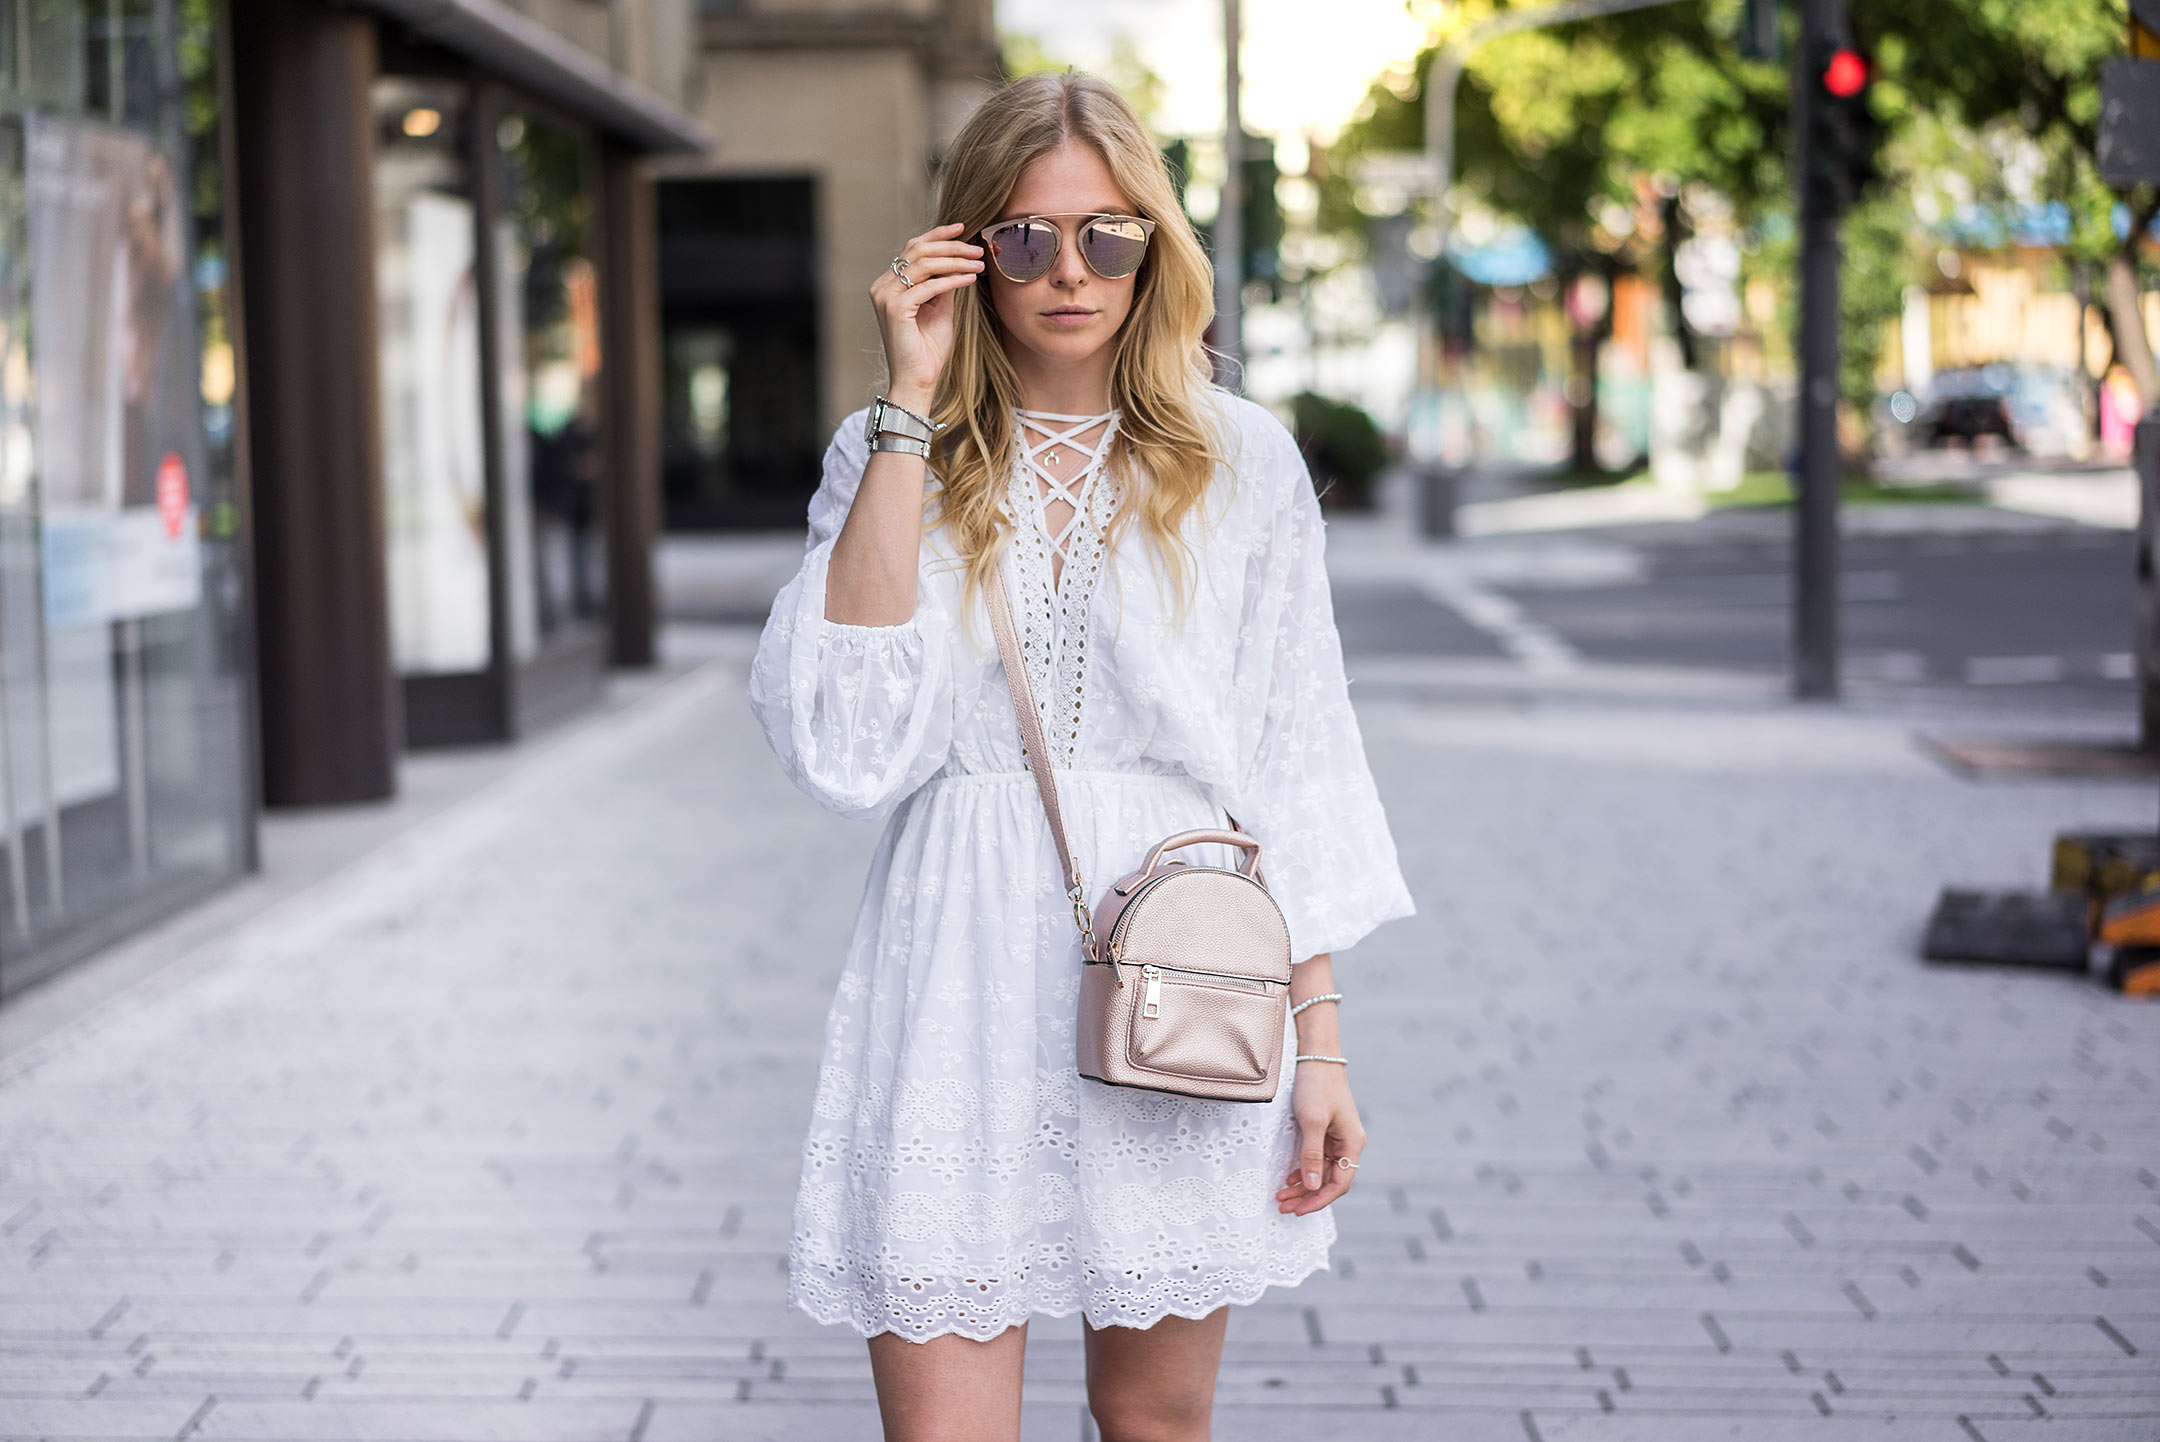 Sunnyinga Spitzenkleid weiss Outfit Fashion Blog Düsseldorf